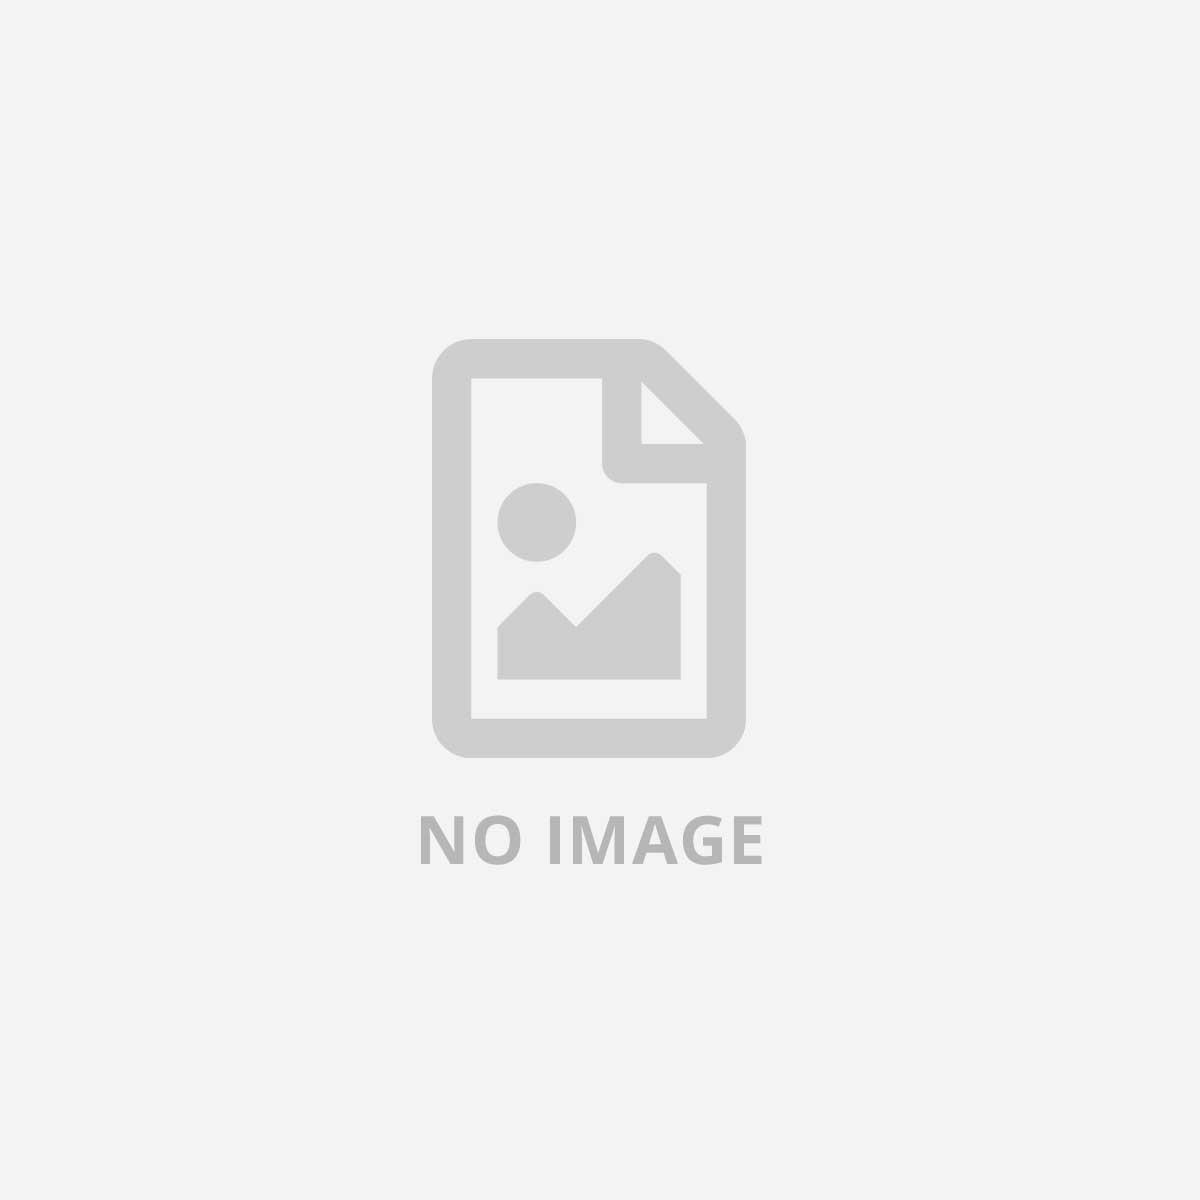 SWISSVOICE CP2502 -IP PHONE 10/100 ENTRY LEVEL